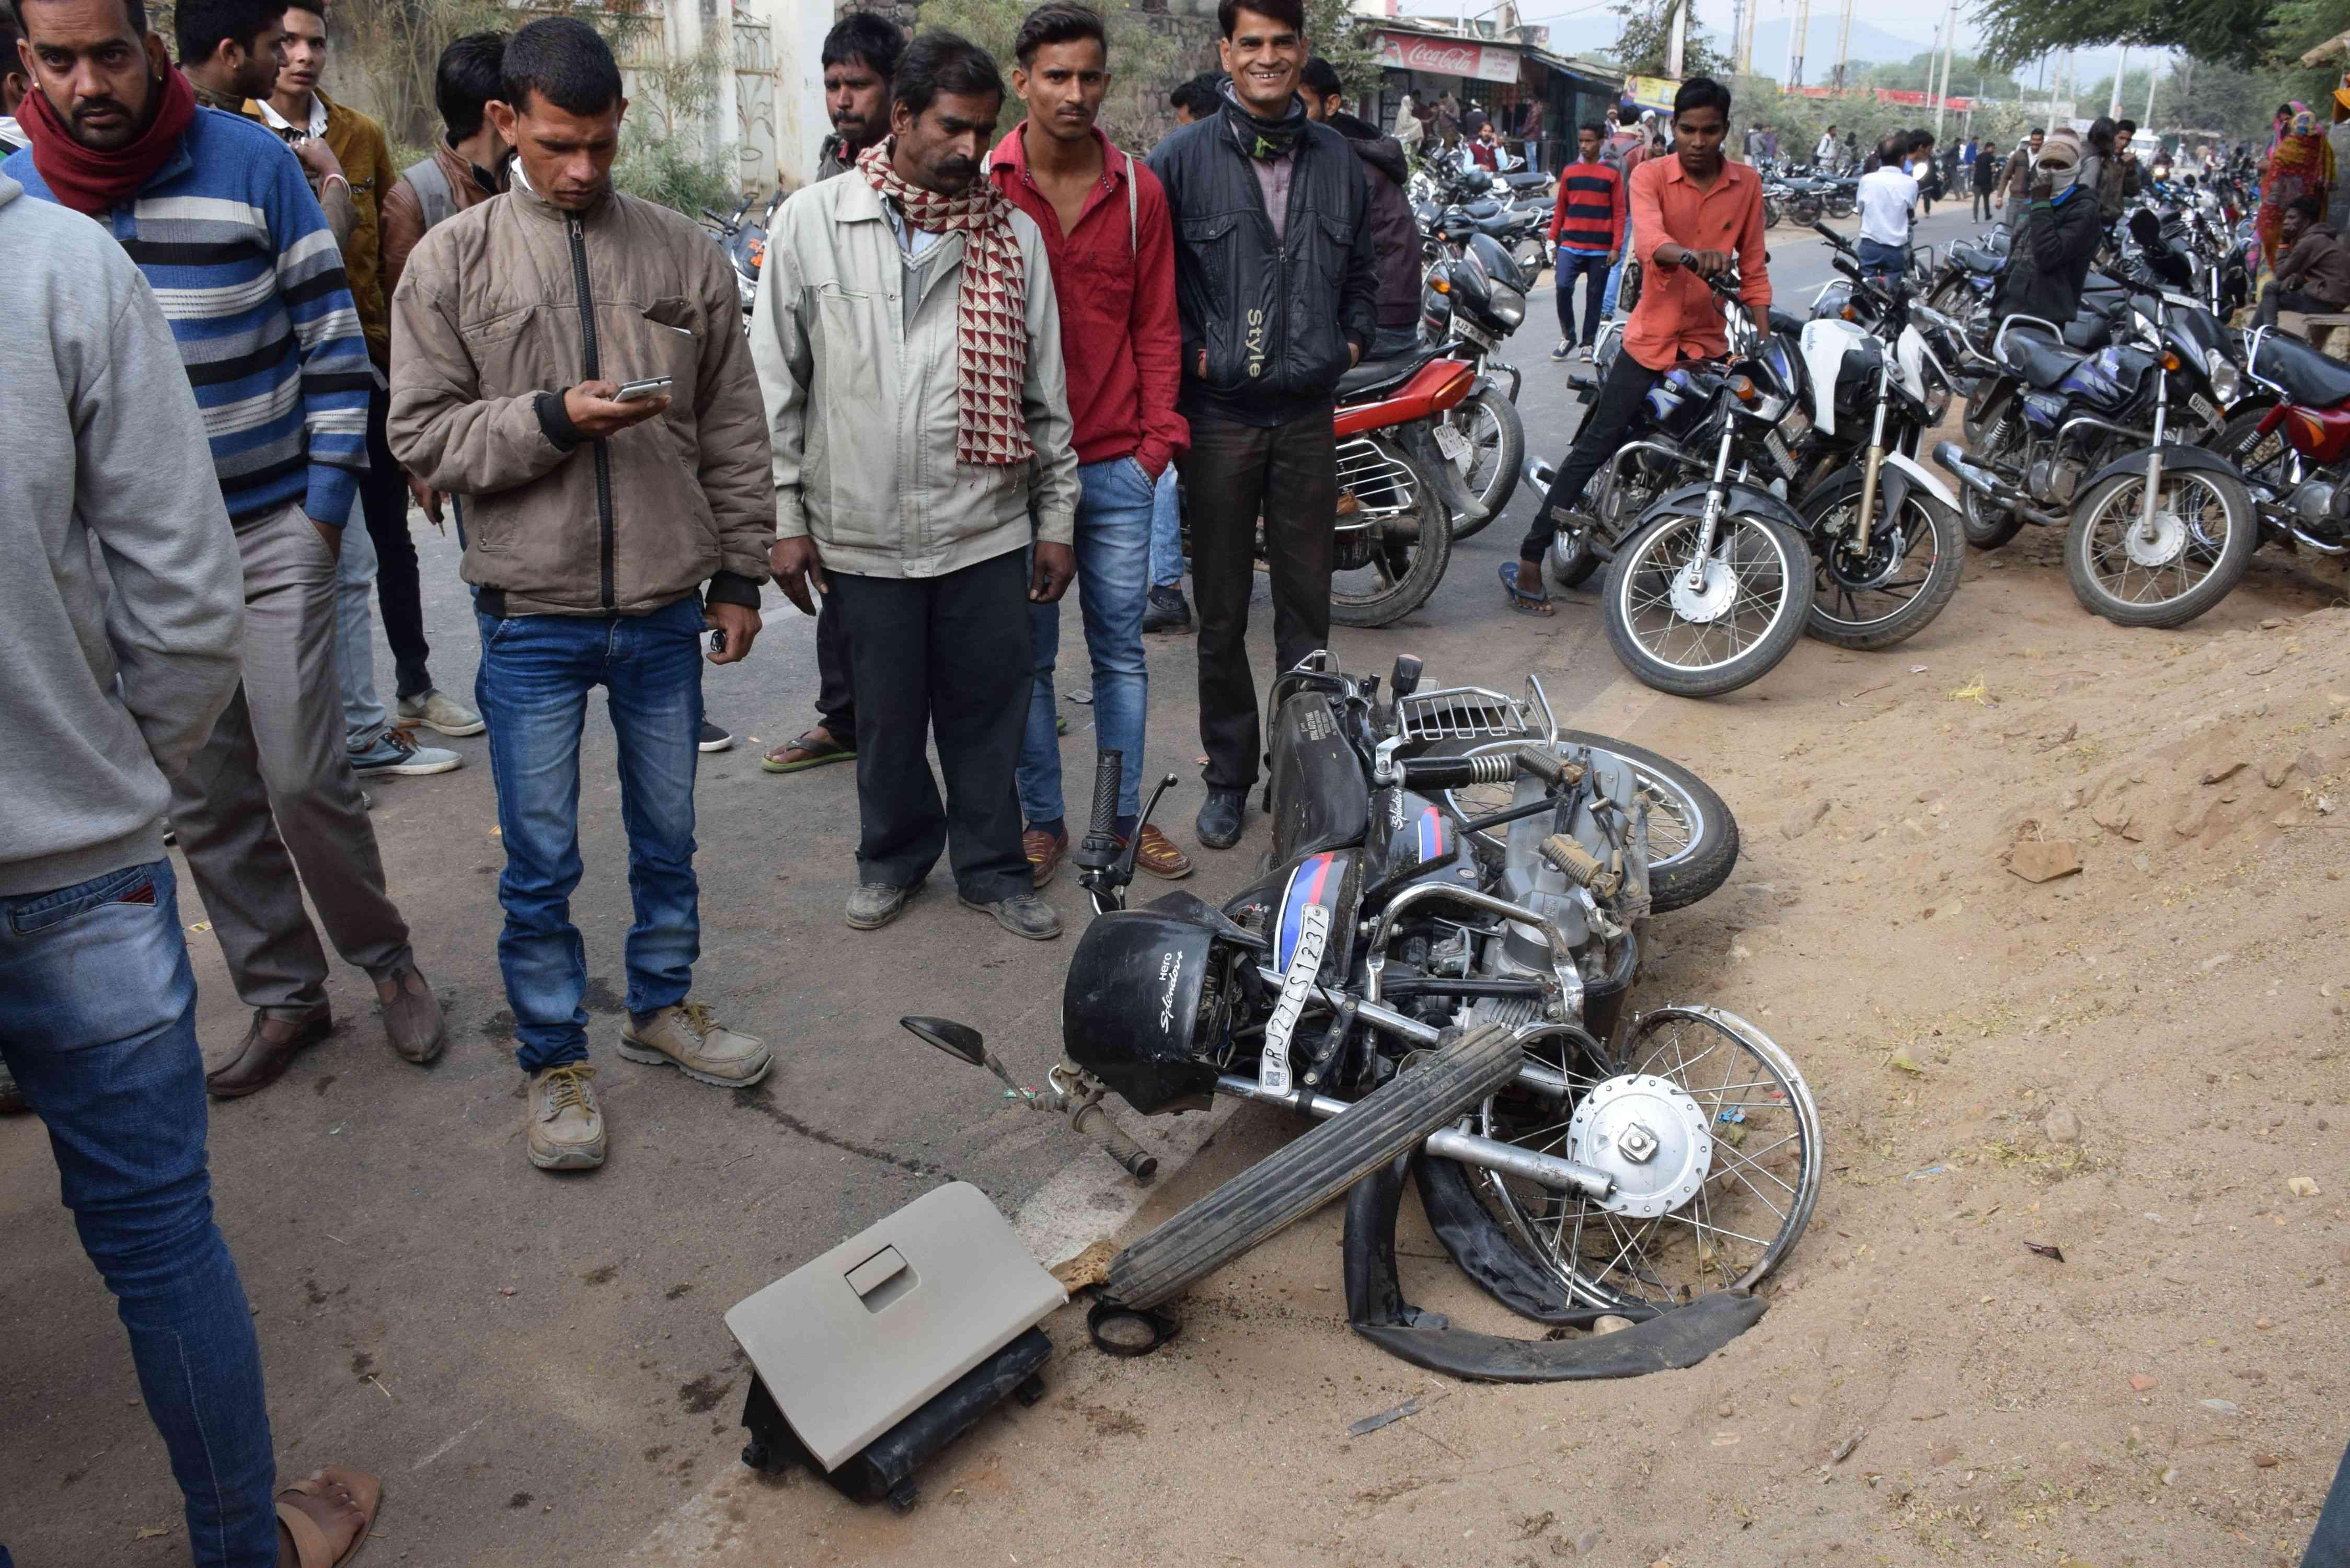 car bike accident badgaun chikalwas road udaipur